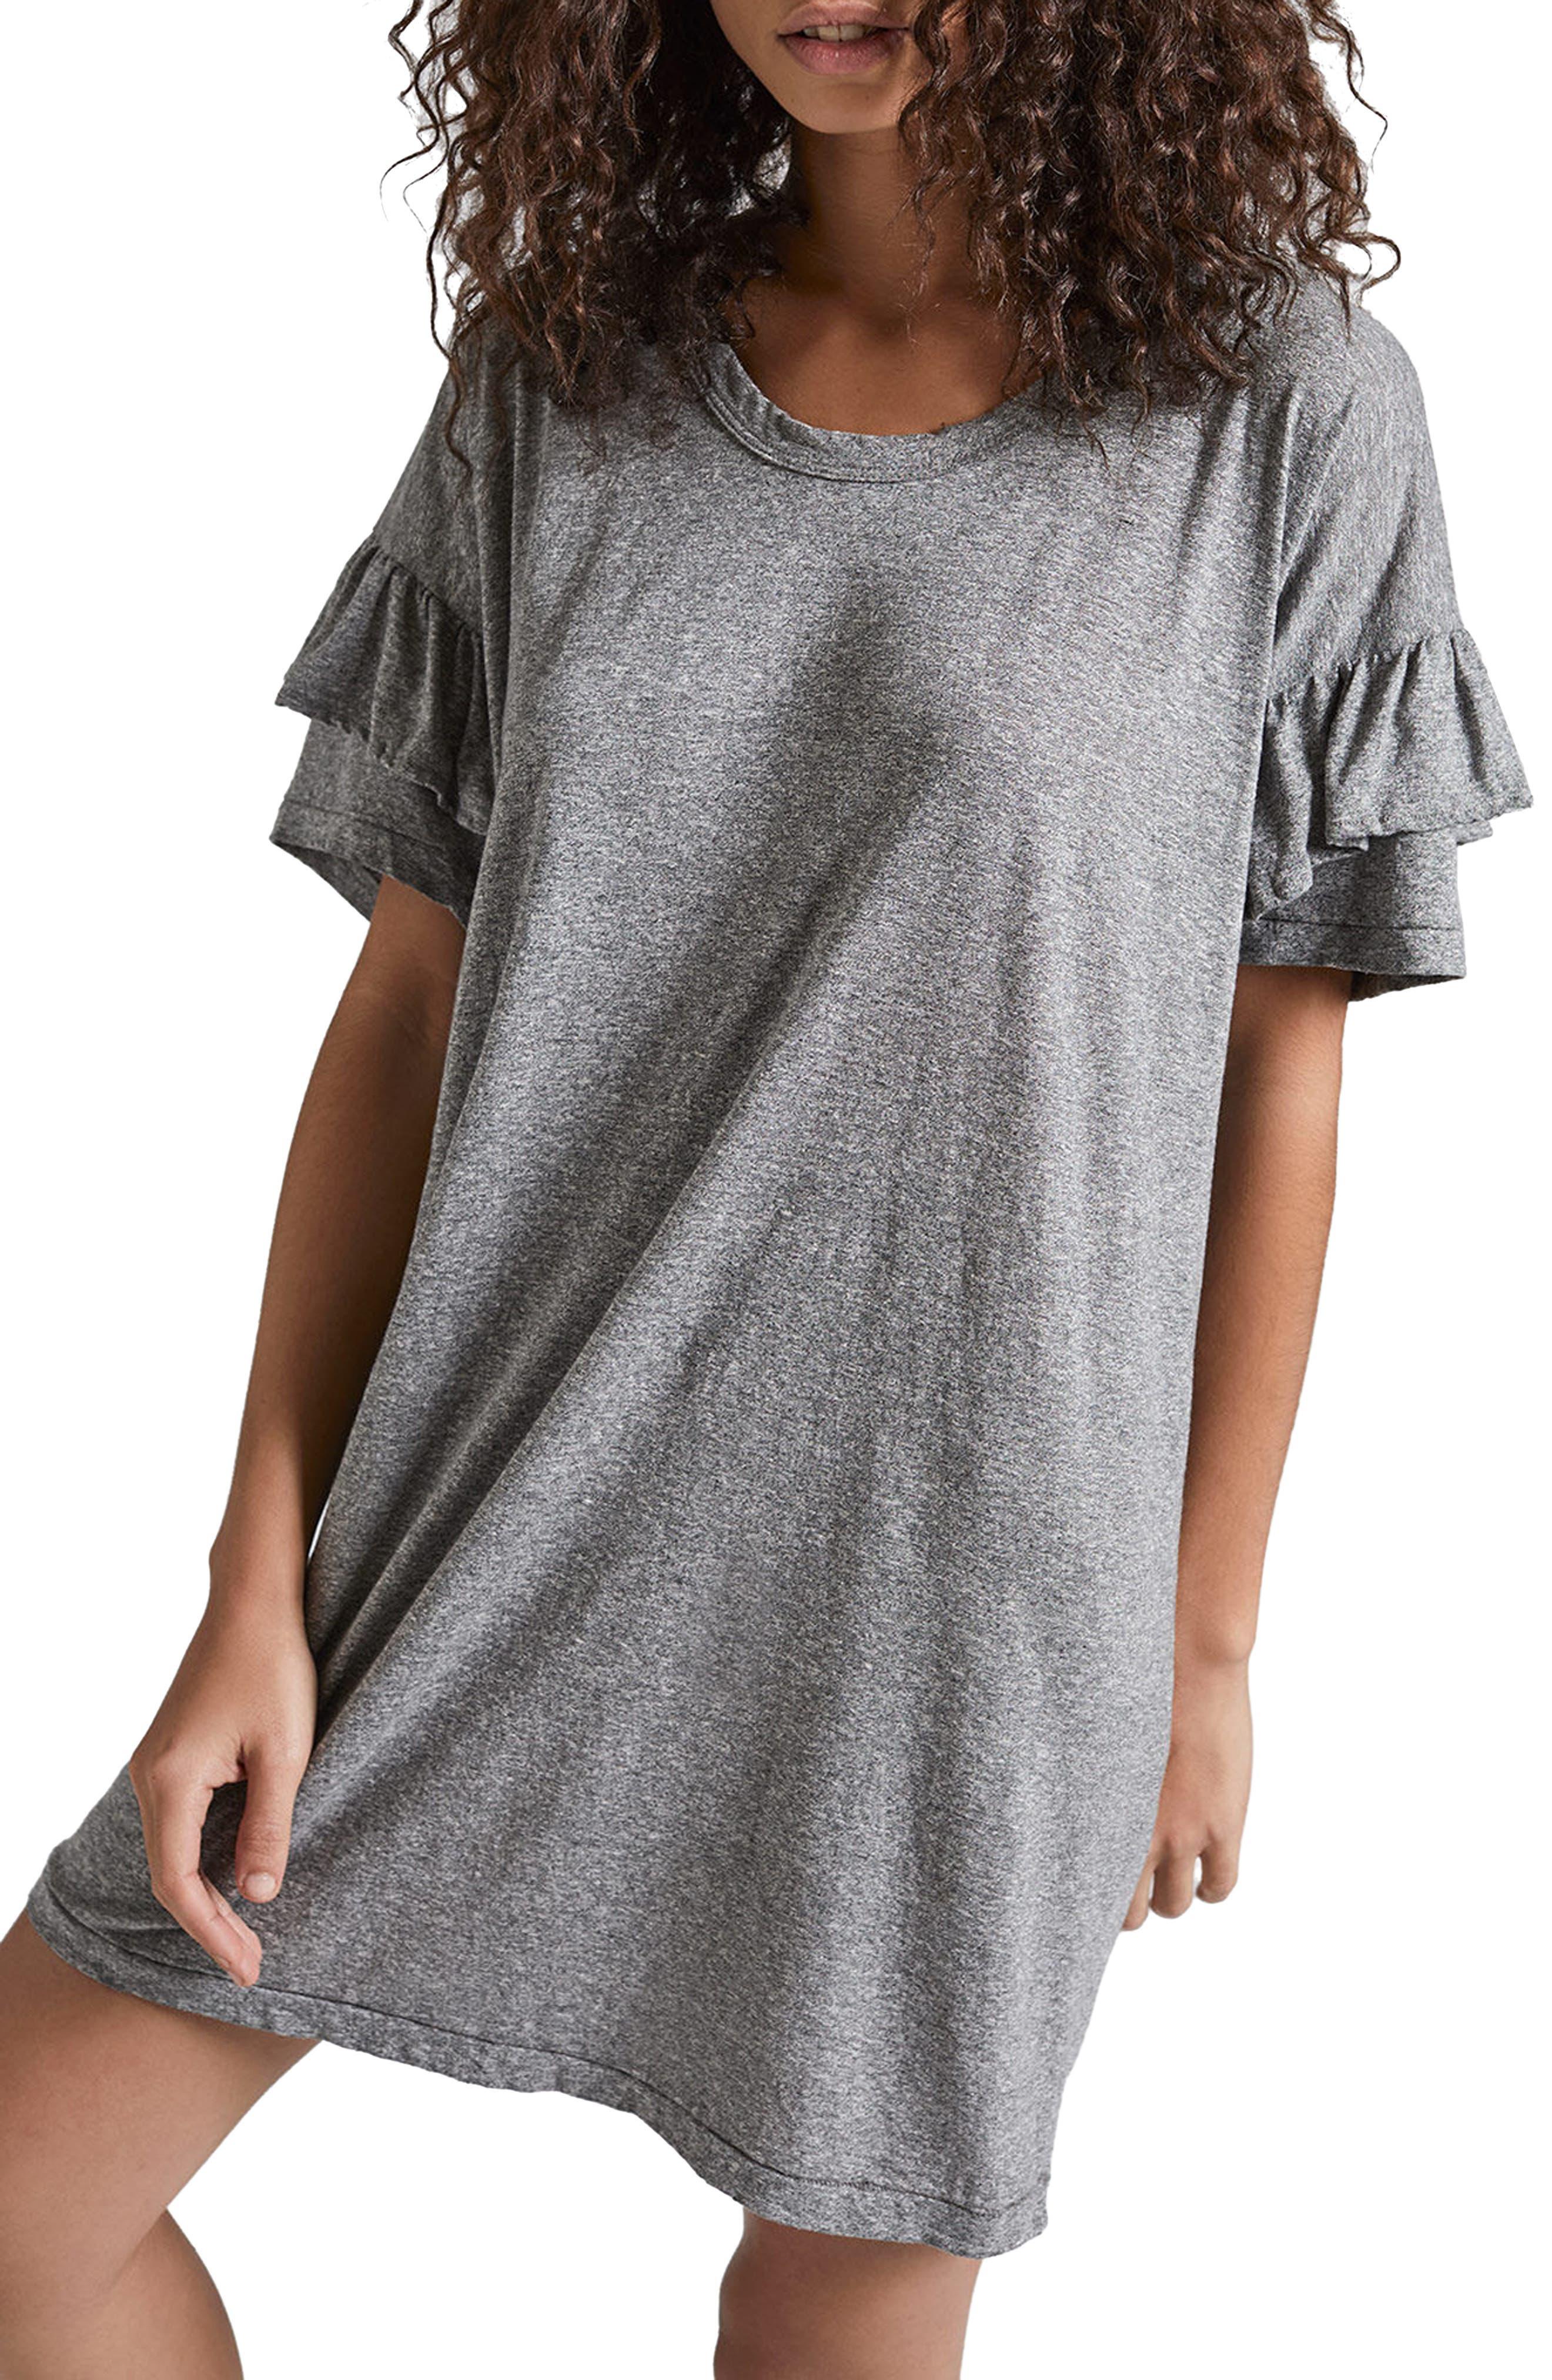 Ruffle Roadie T-Shirt Dress,                         Main,                         color, 099